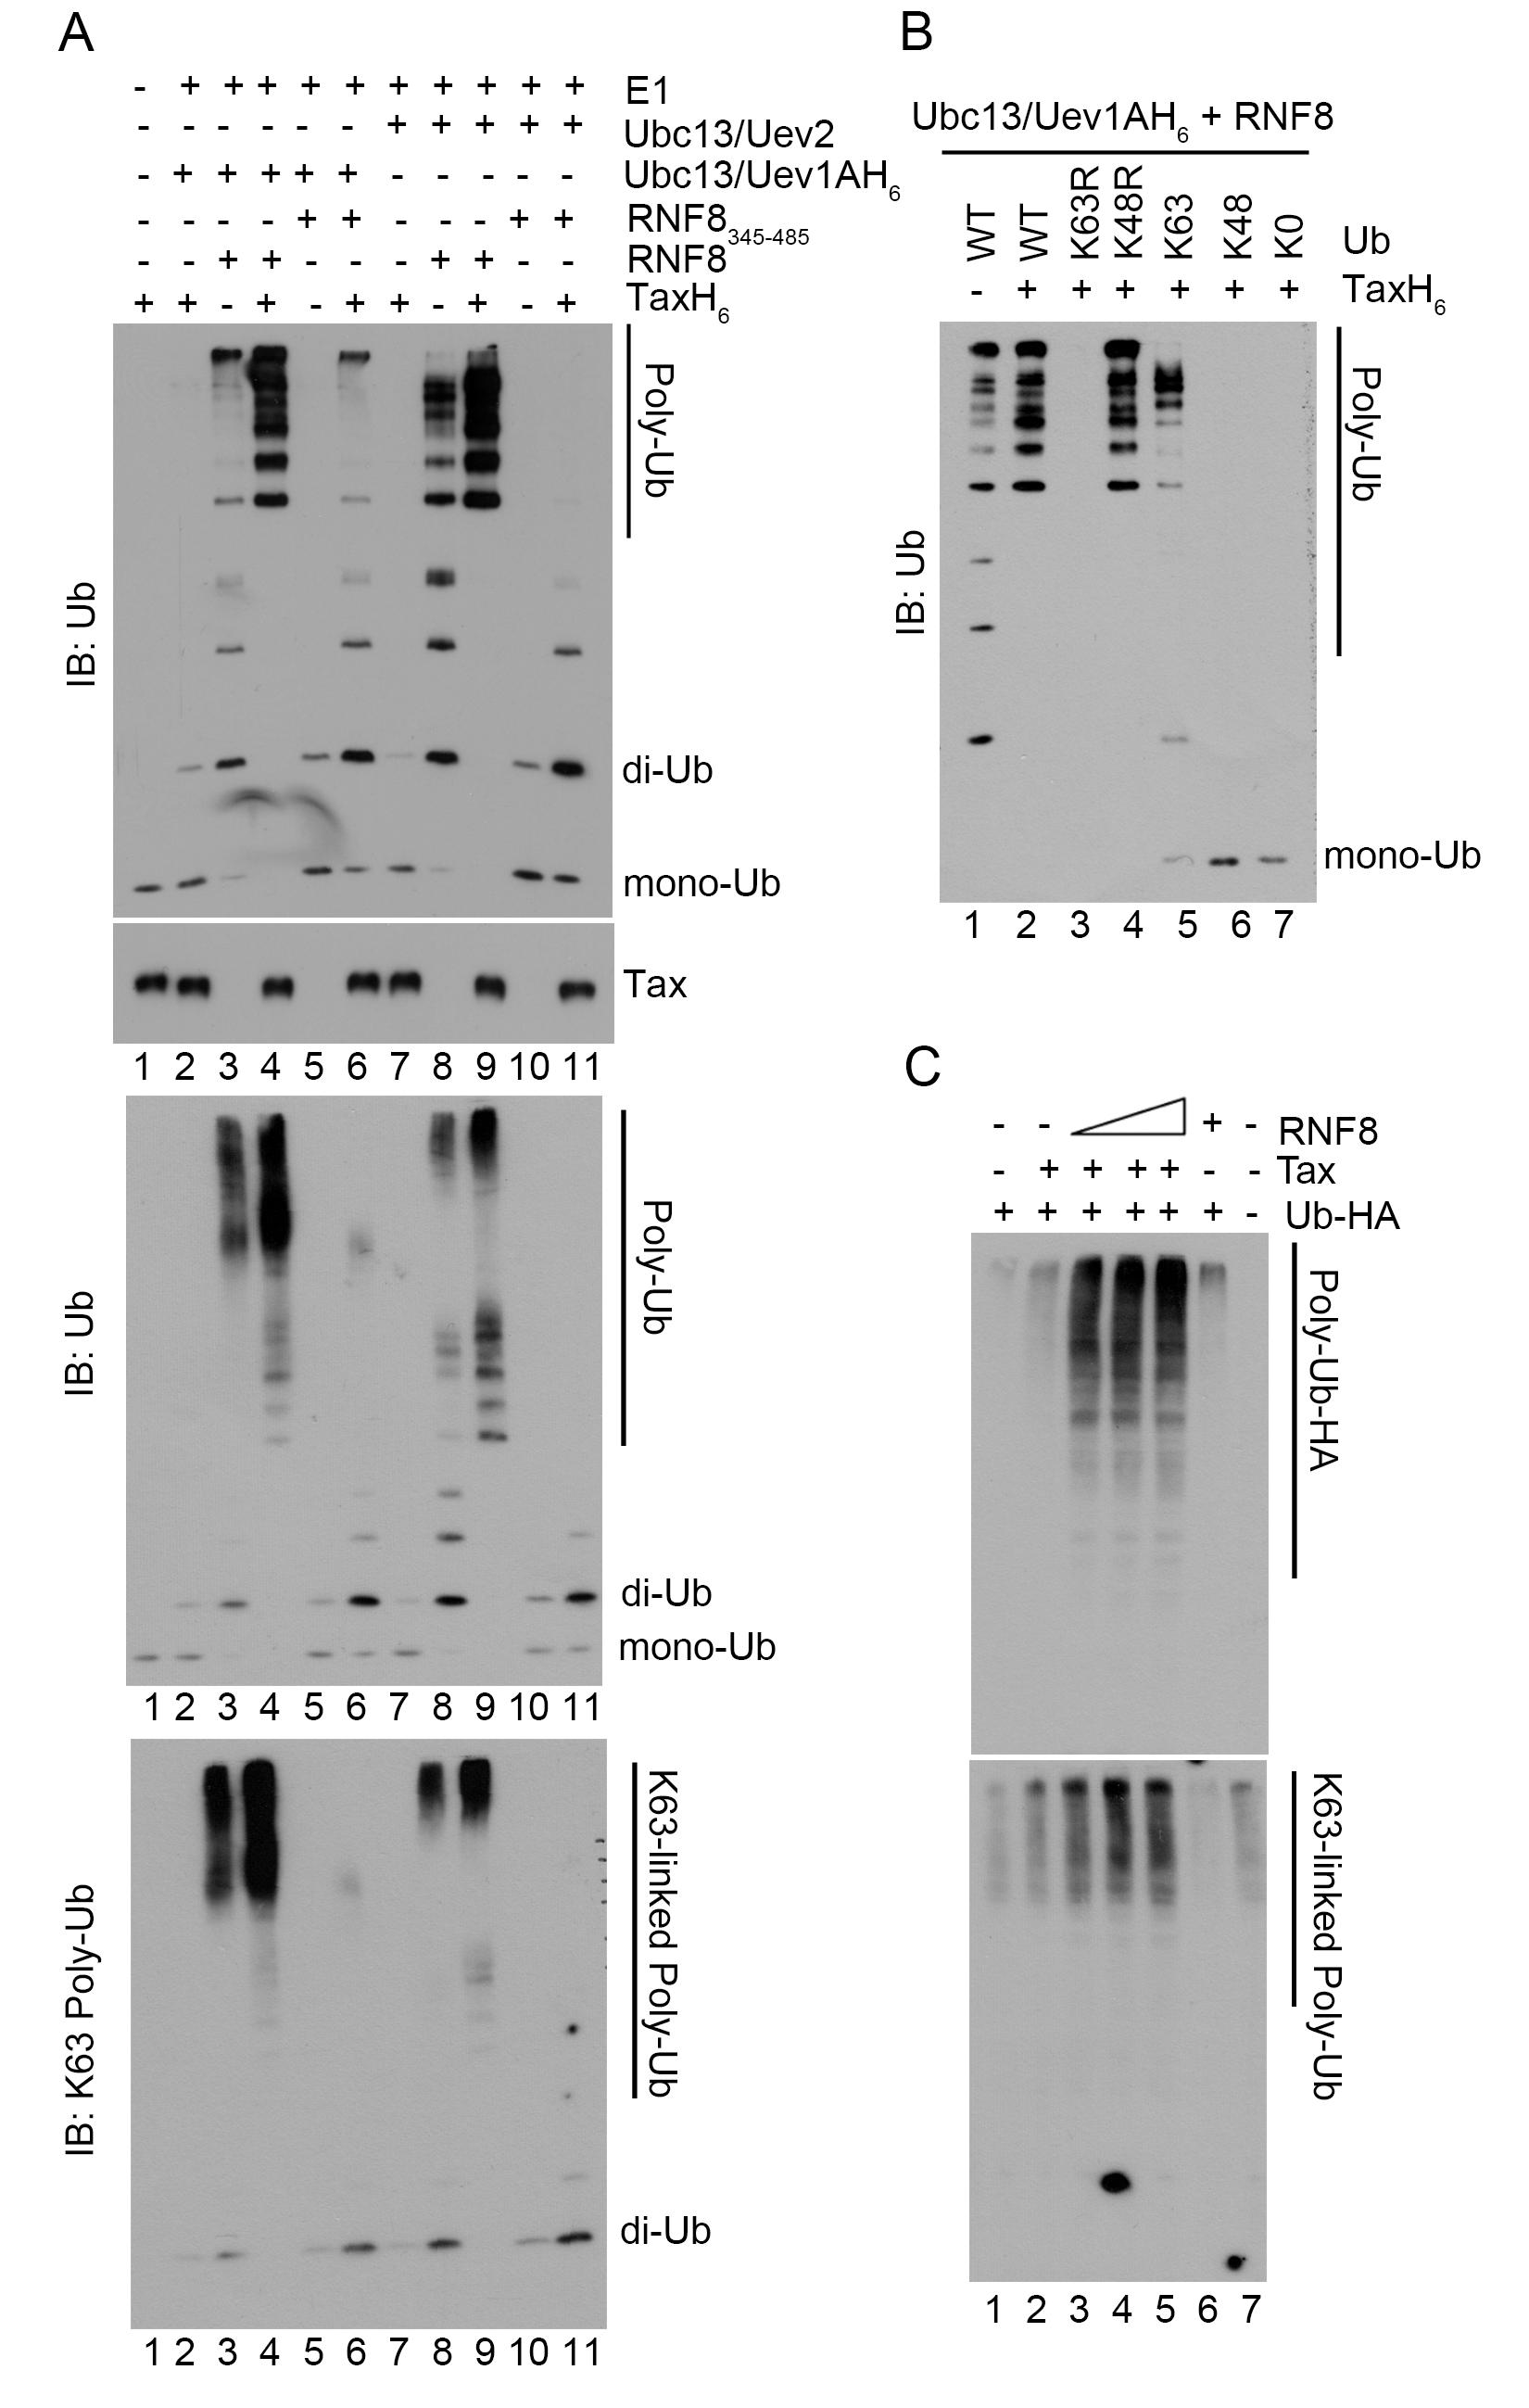 Tax stimulates RNF8 and Ubc13:Uev1A/2 to assemble long K63-pUb.